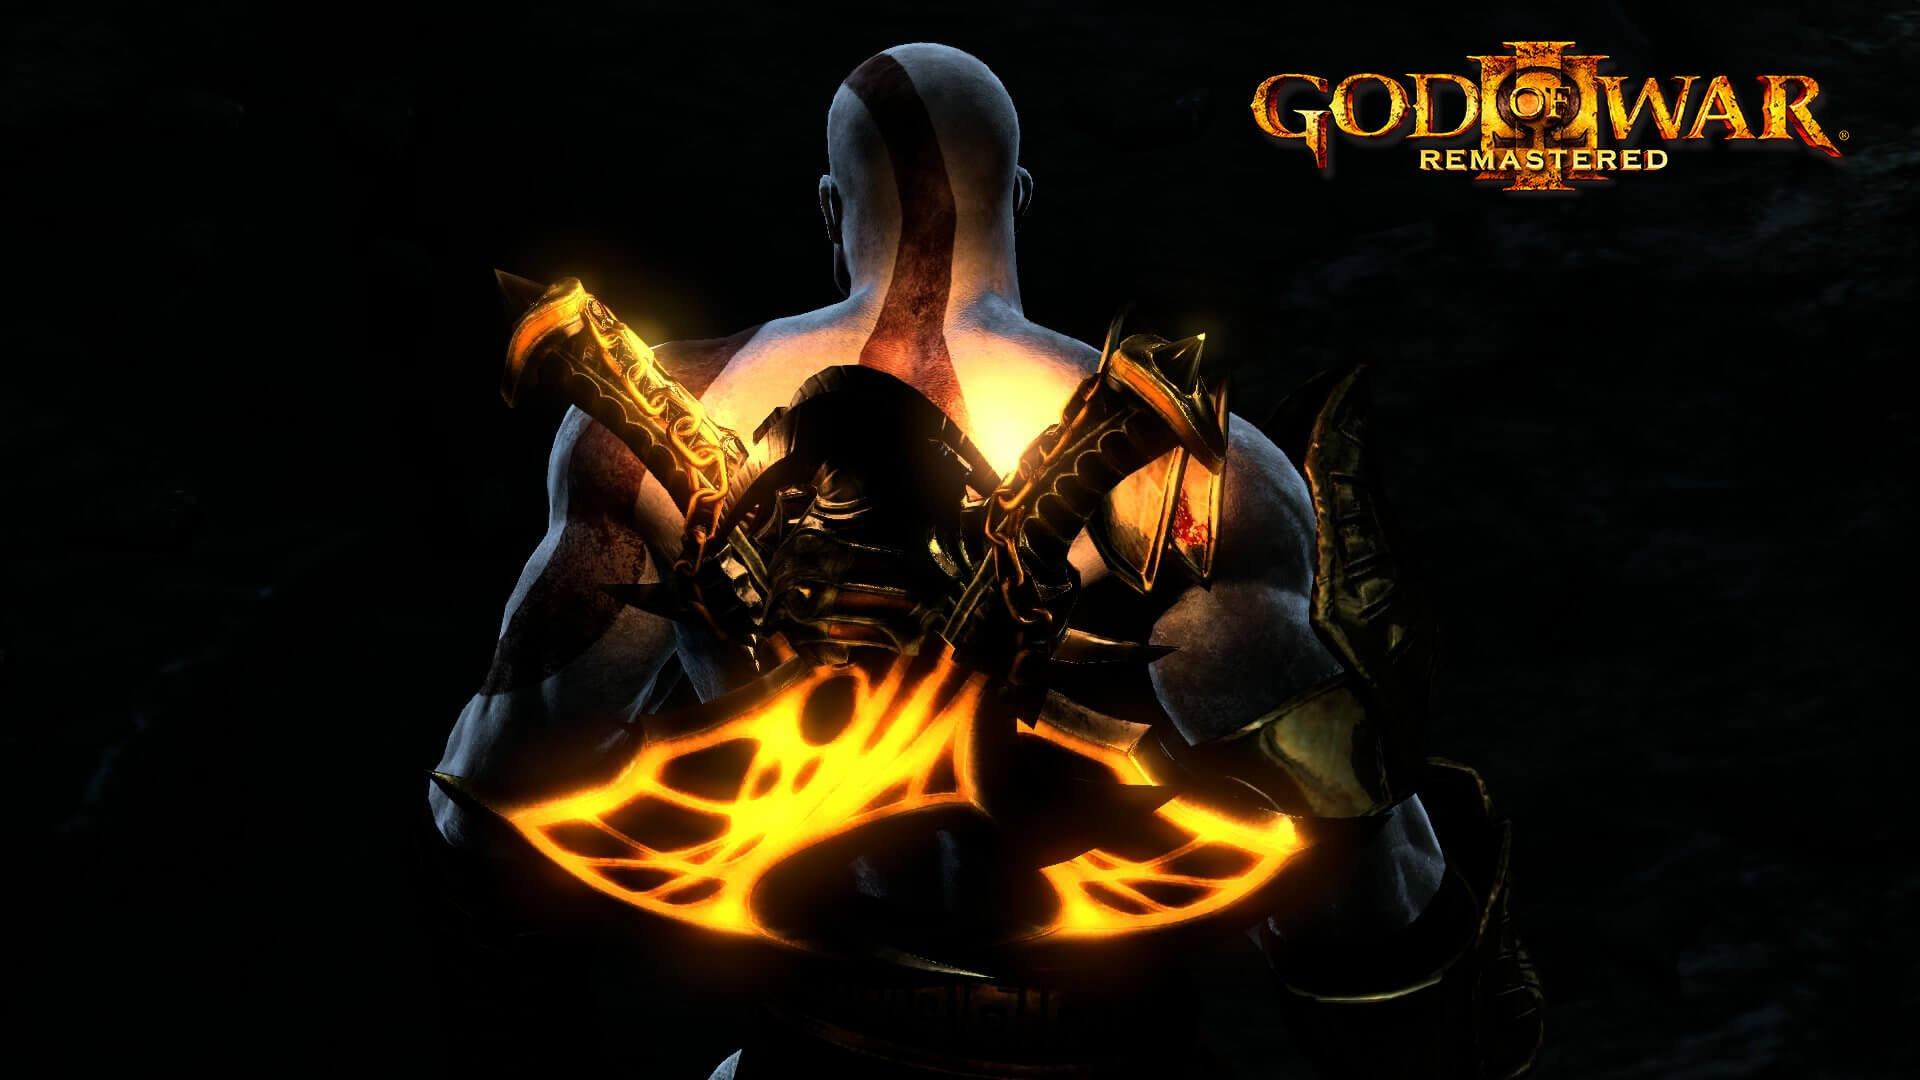 Постер God of War III Remastered